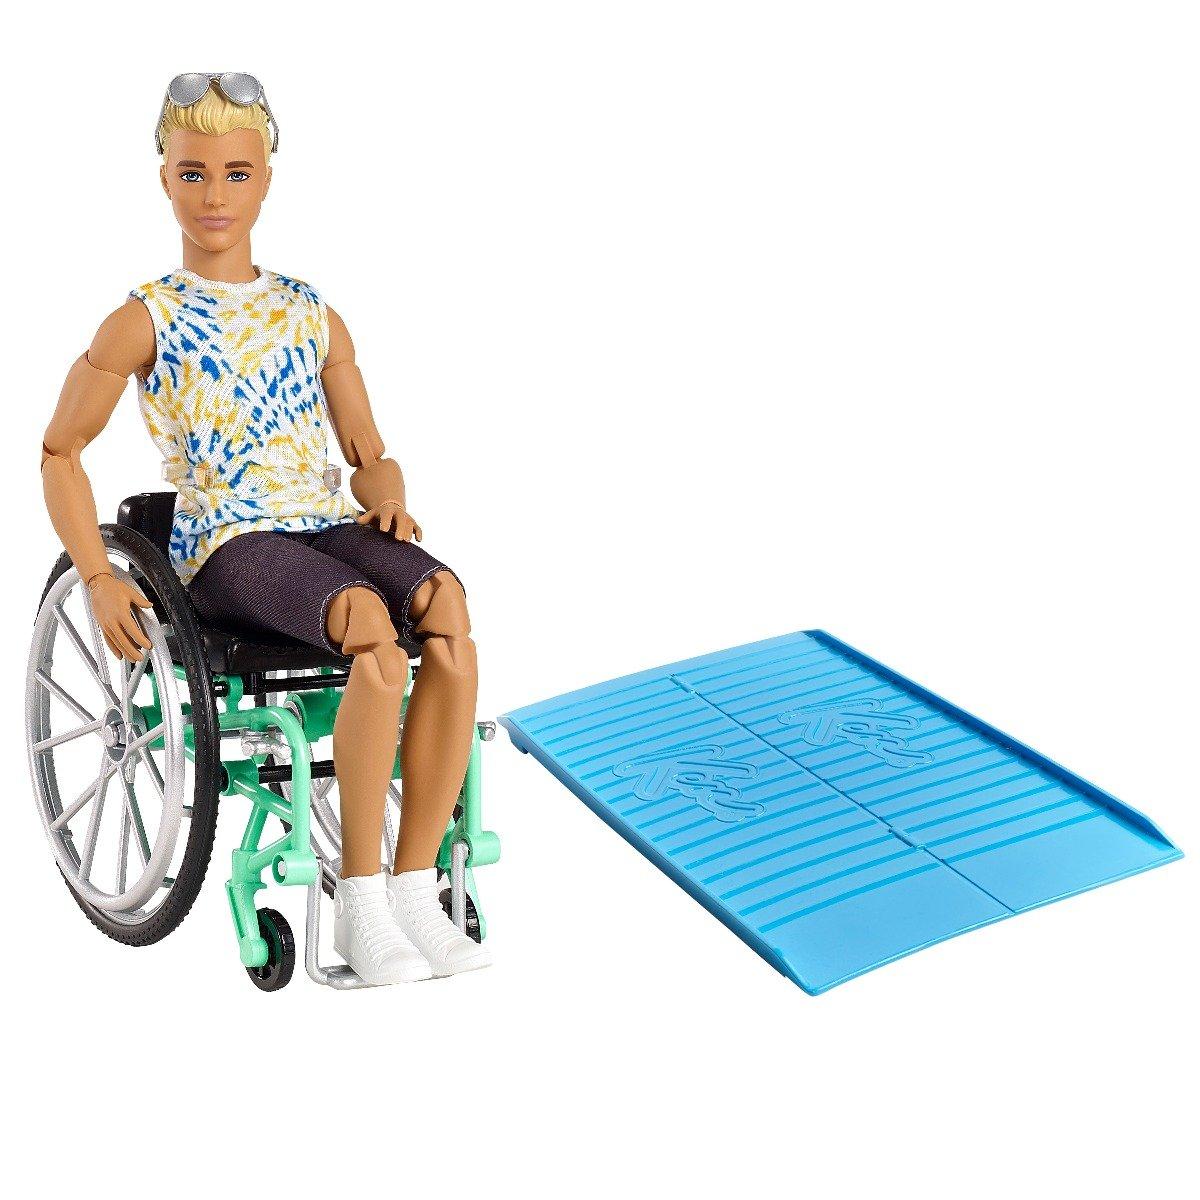 Papusa Barbie Fashionistas, Ken in scaun cu rotile, 167